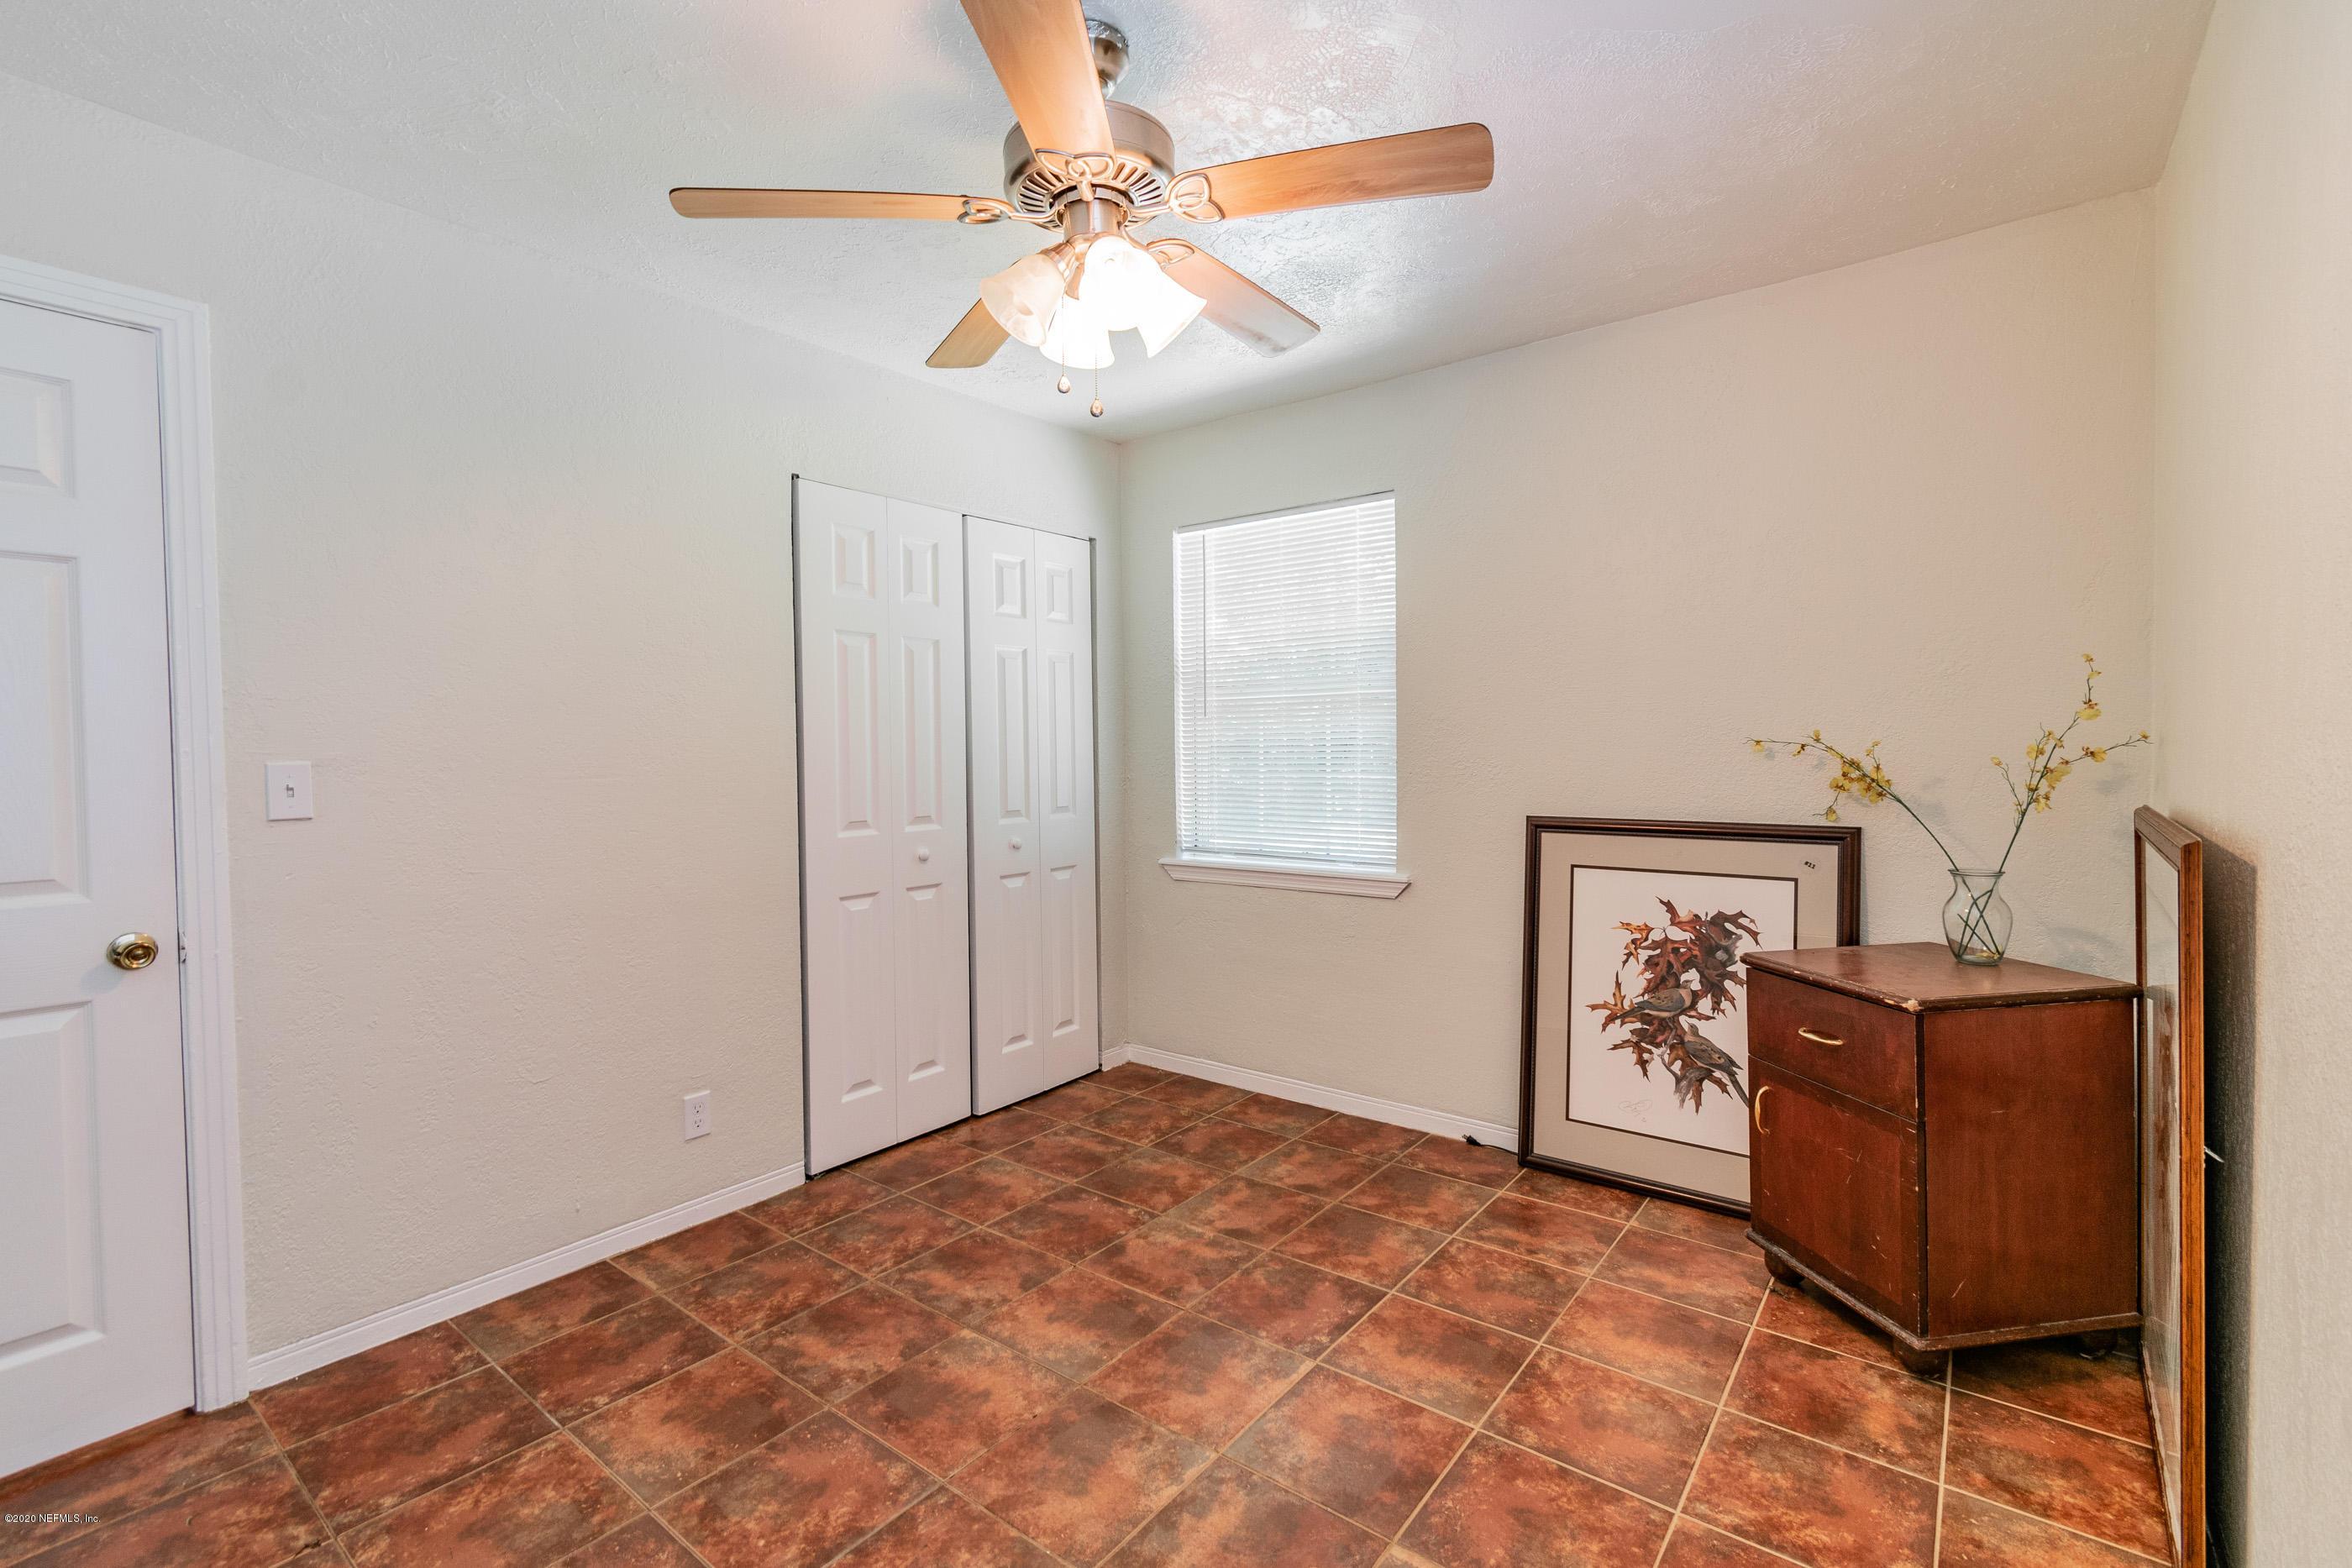 5727 BRAIT, JACKSONVILLE, FLORIDA 32209, 3 Bedrooms Bedrooms, ,1 BathroomBathrooms,Residential,For sale,BRAIT,1058978